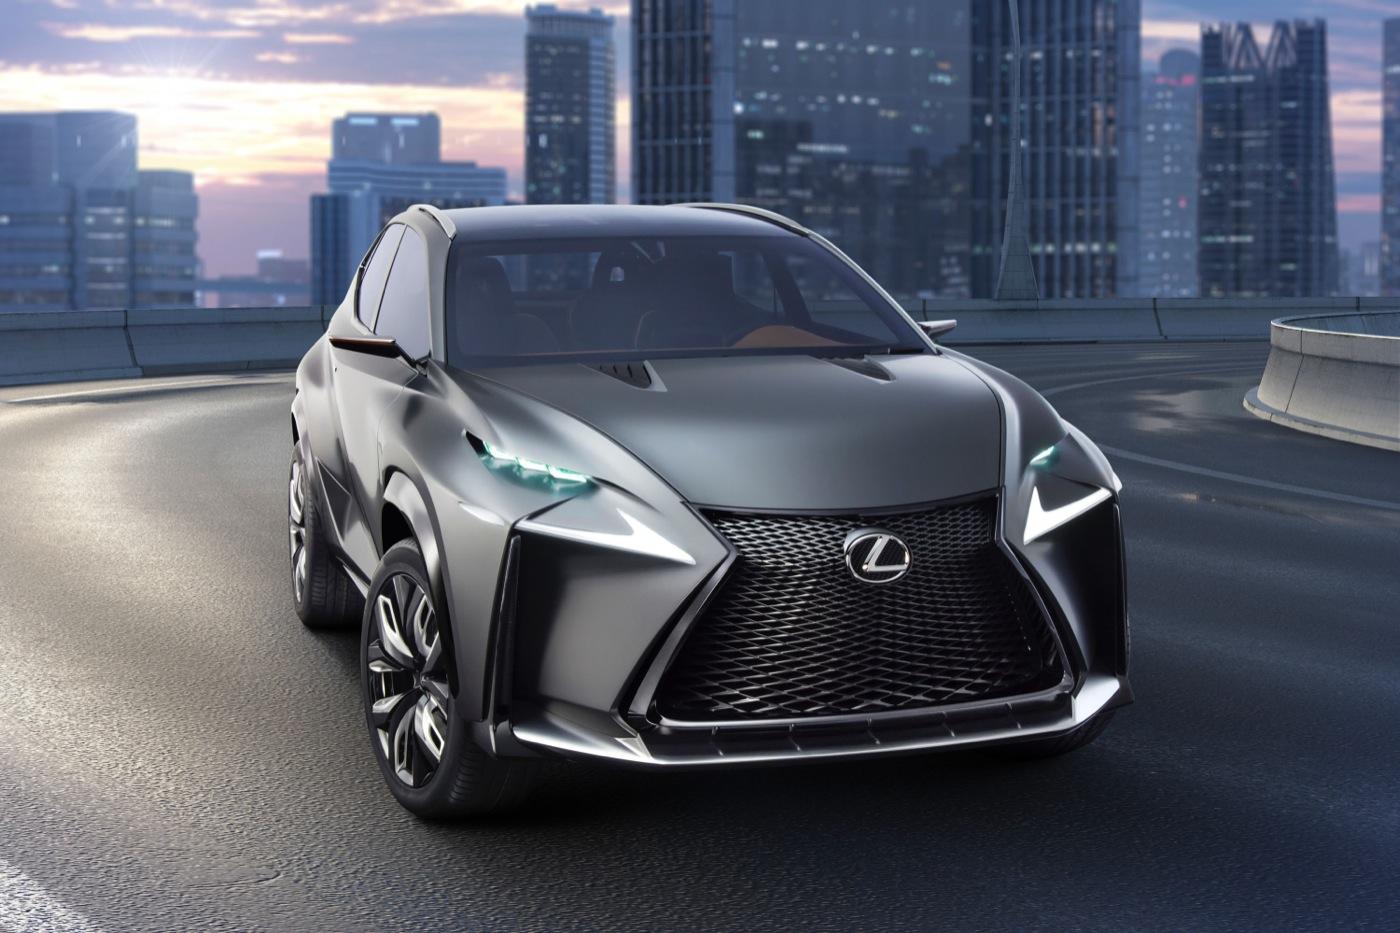 2014 Lexus LF-NX concept